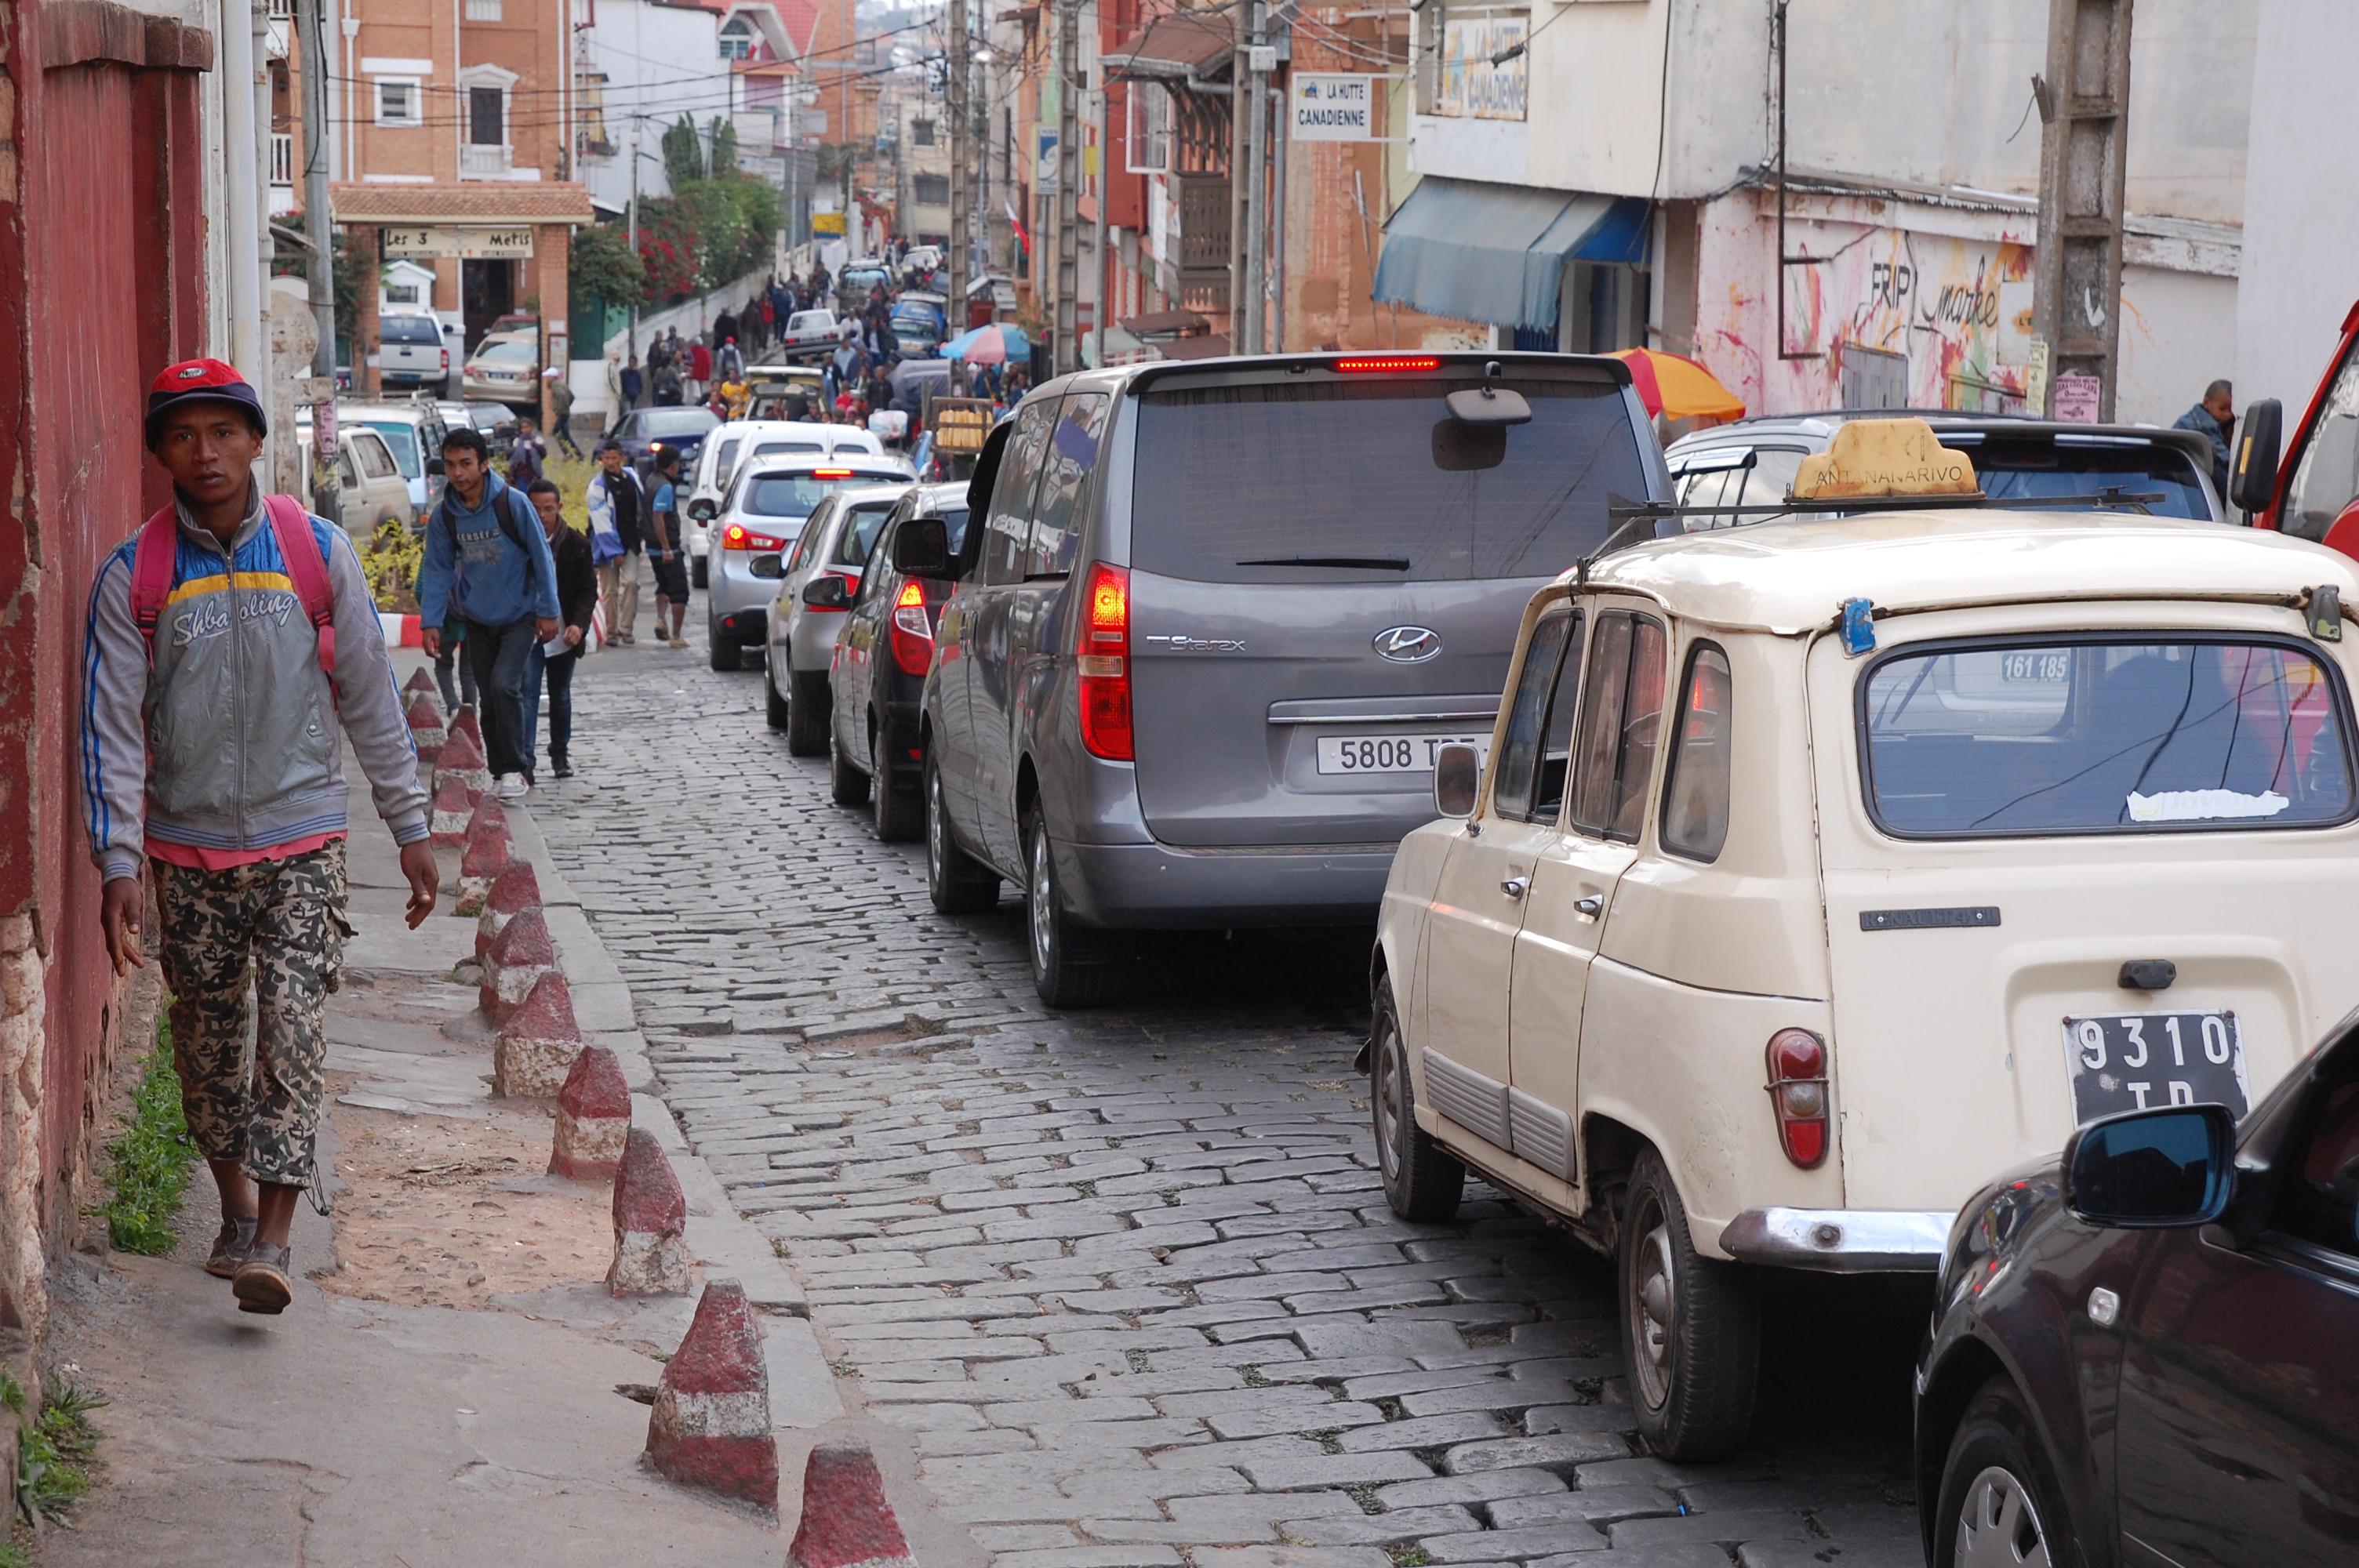 Tana cobbled street